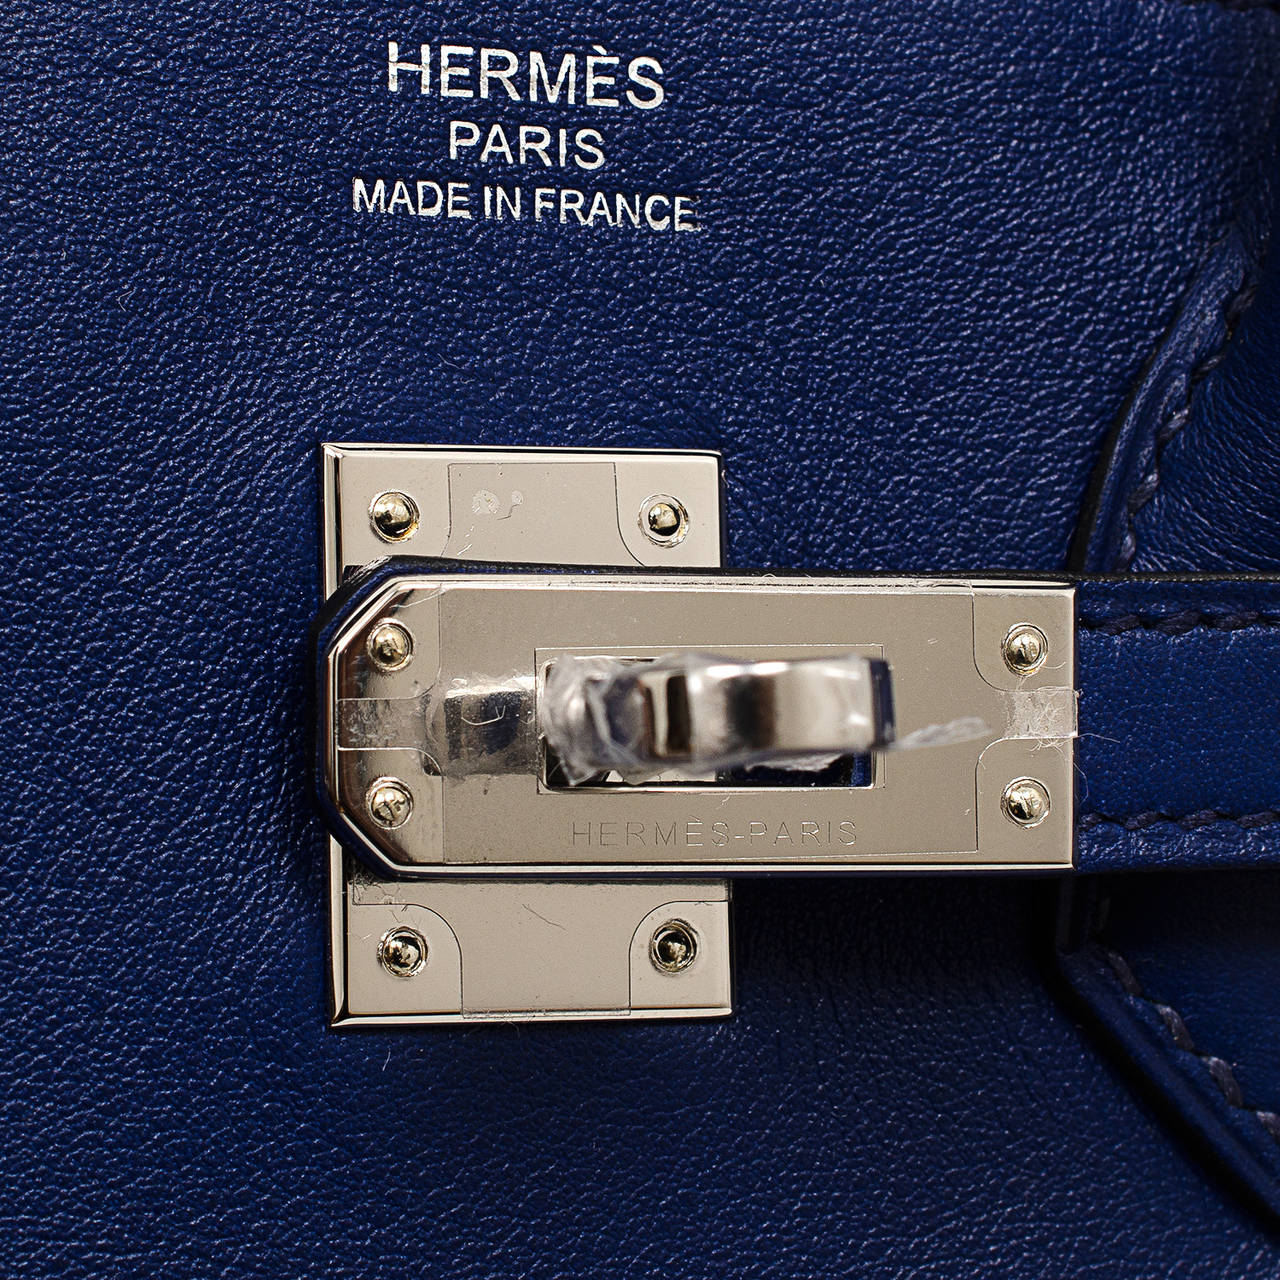 louis vuitton ostrich bag - Hermes Blue Sapphire Swift Birkin 25cm Palladium Hardware at 1stdibs